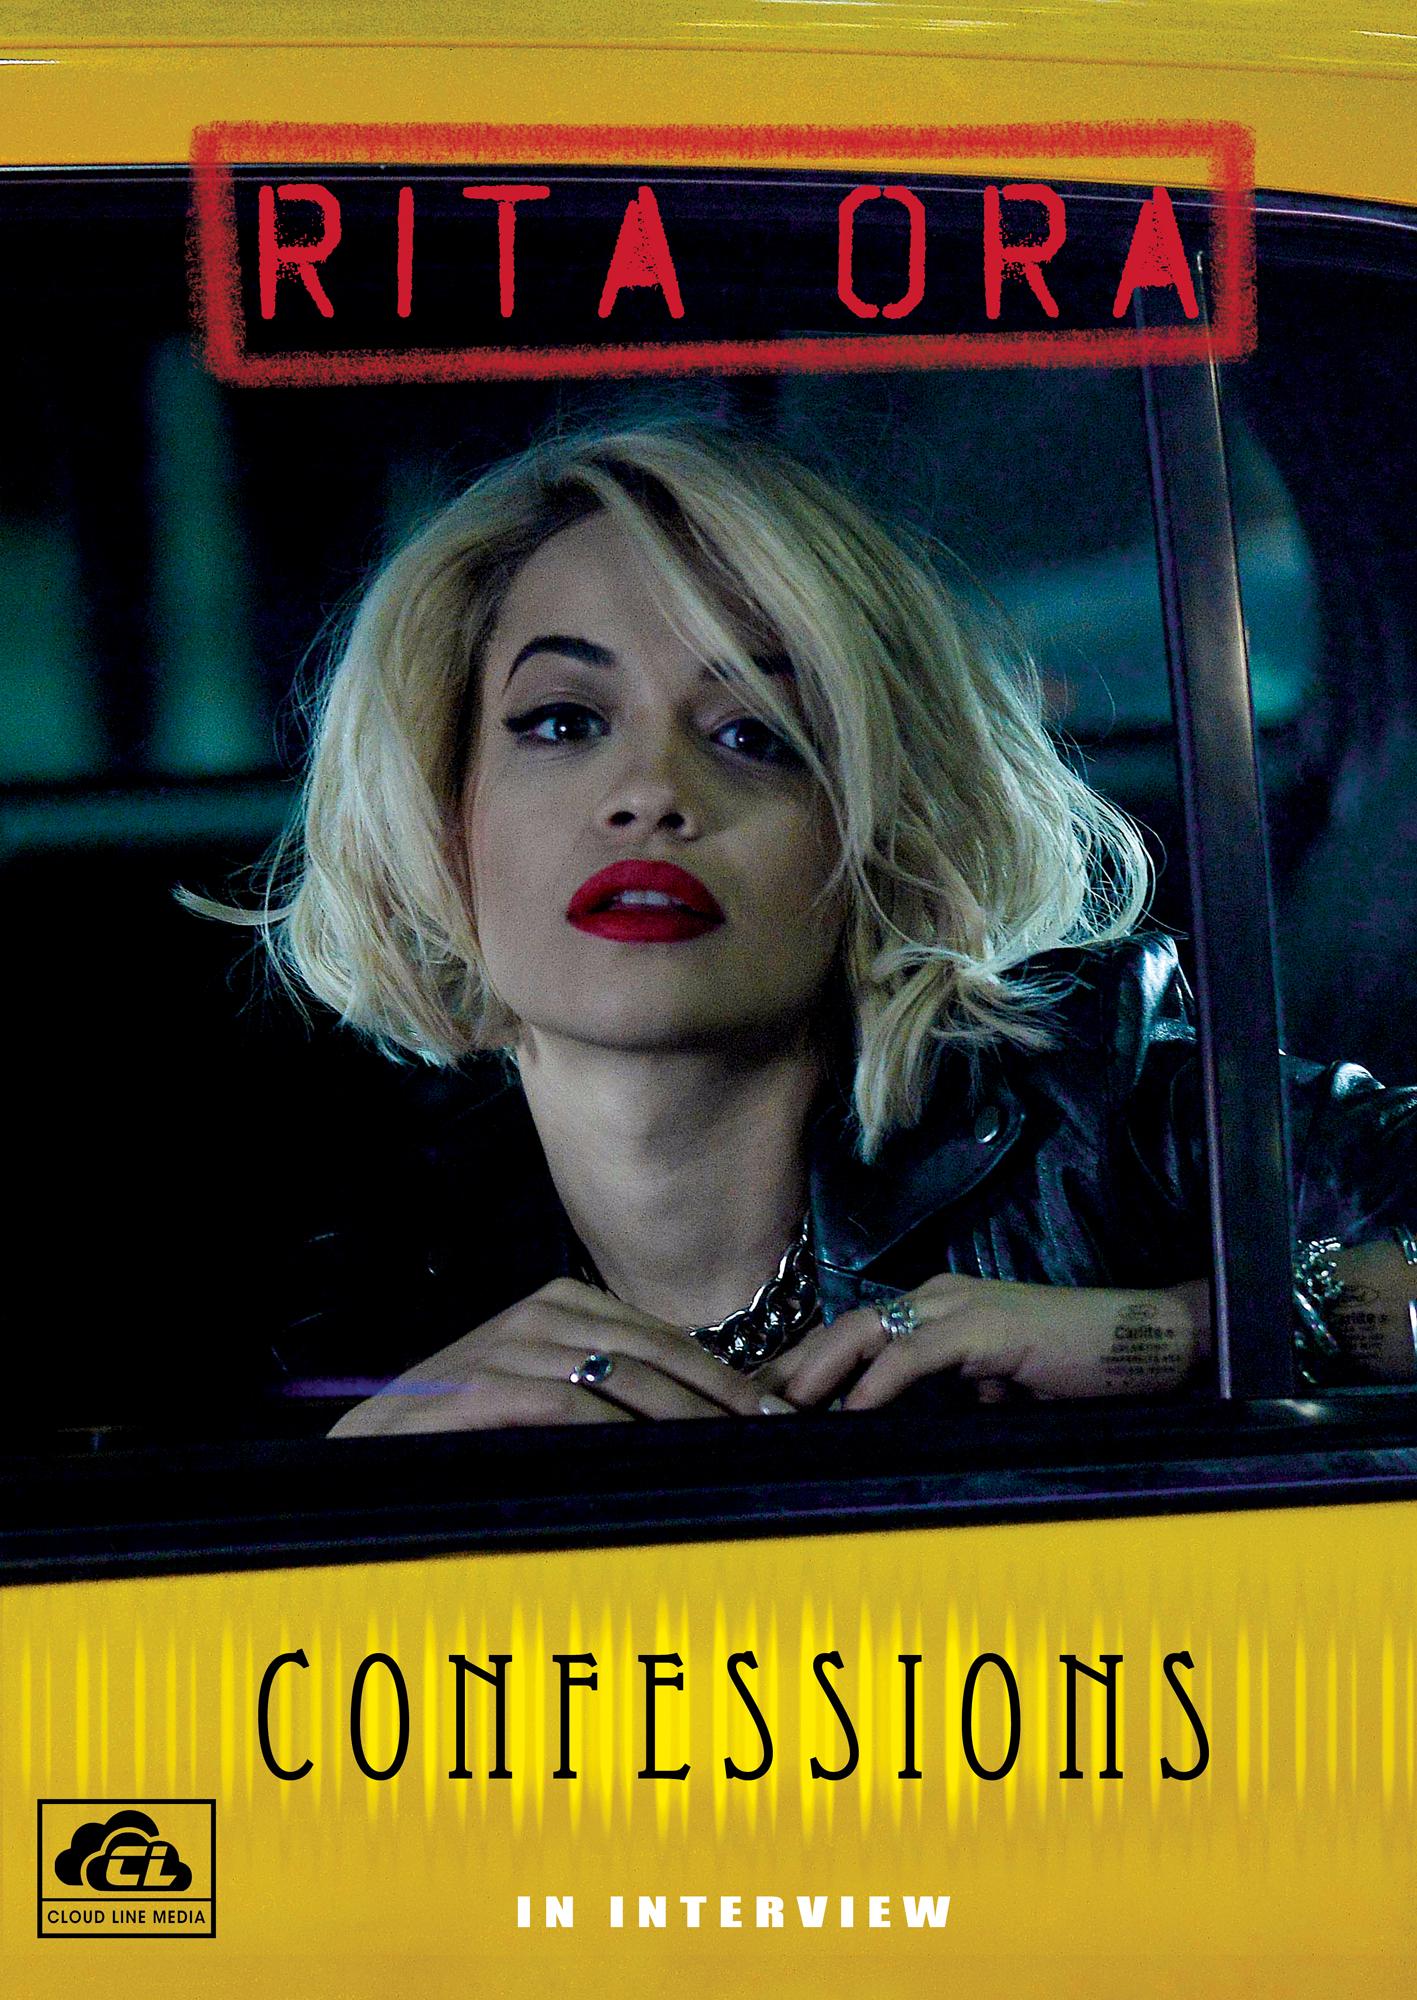 Rita Ora: Confessions